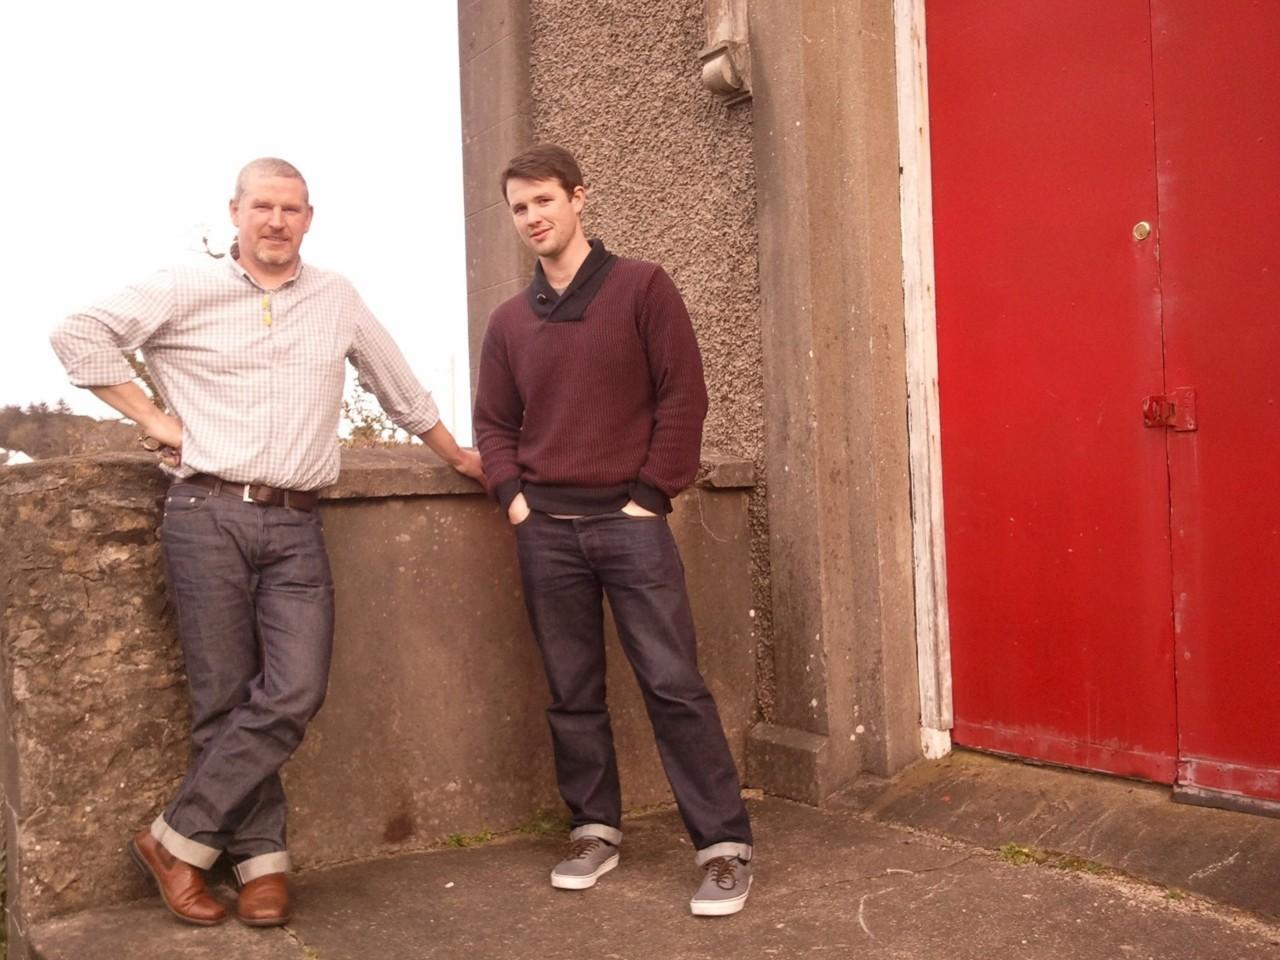 This is Sean and Kieran Molloy